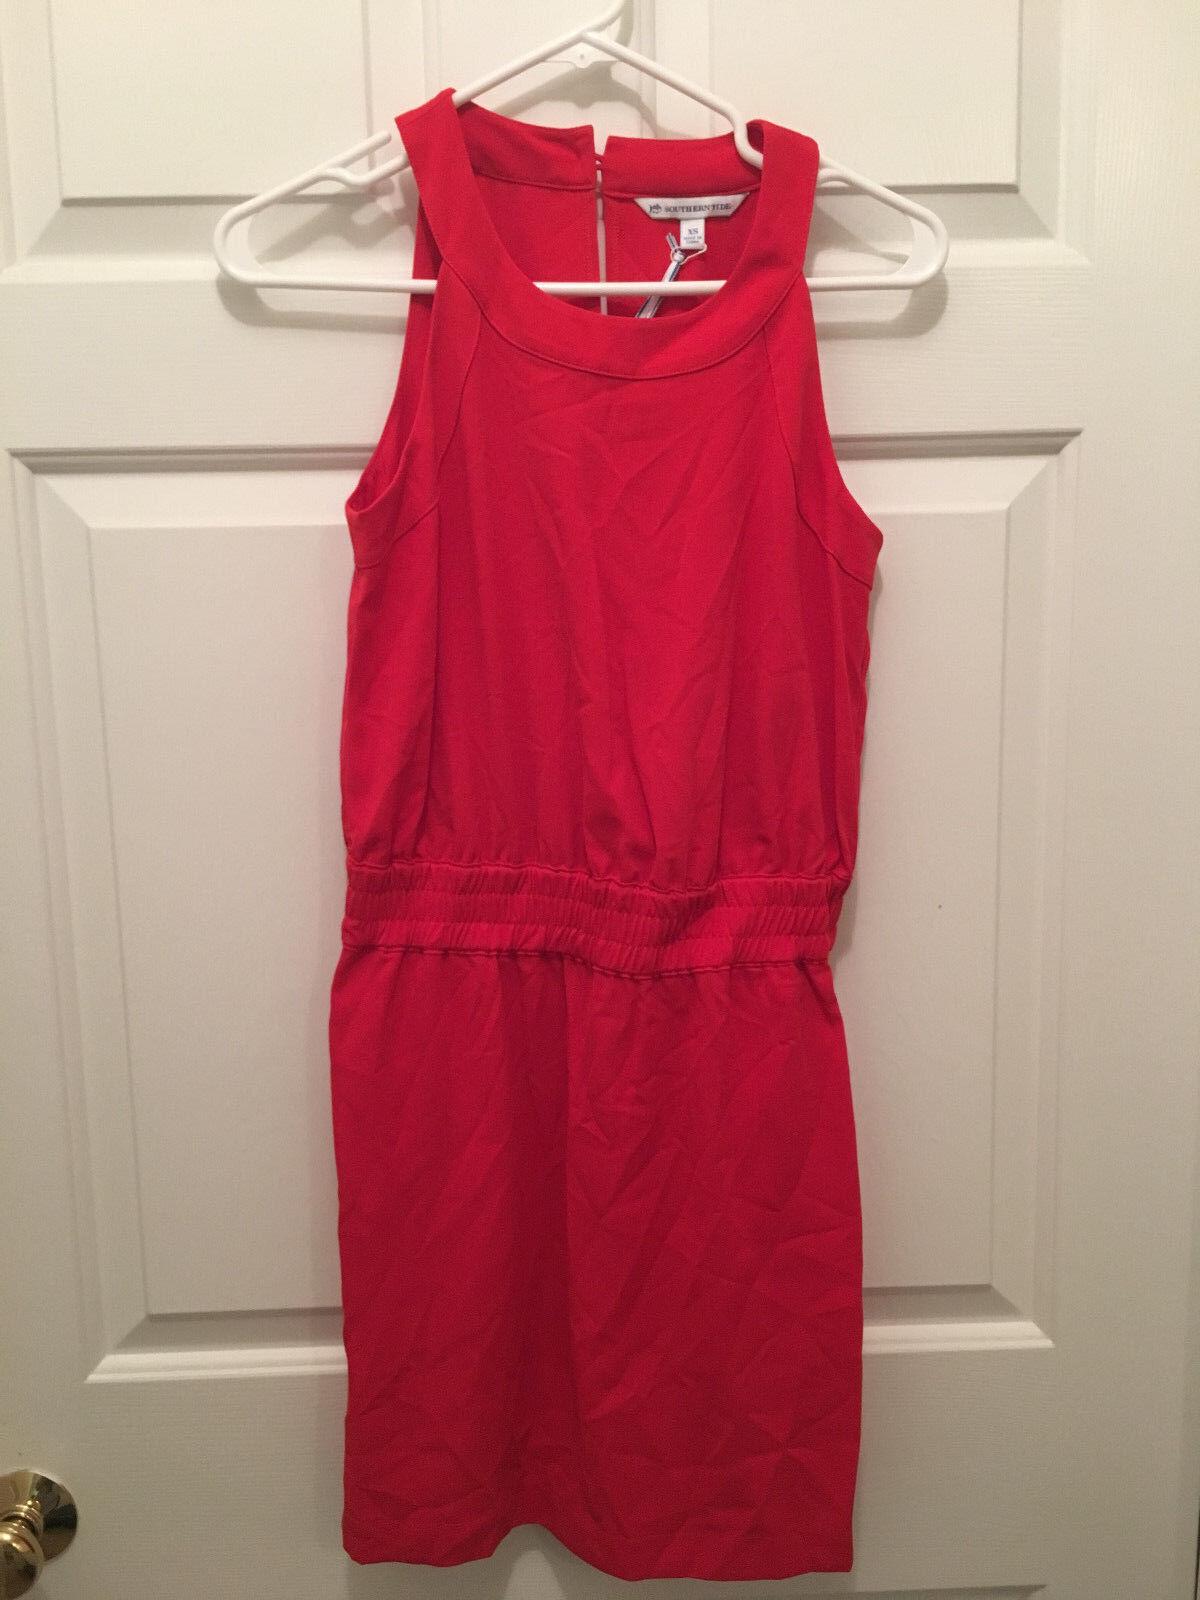 NWT Southern Tide Woherren King Street Varsity rot Sleeveless Dress Large